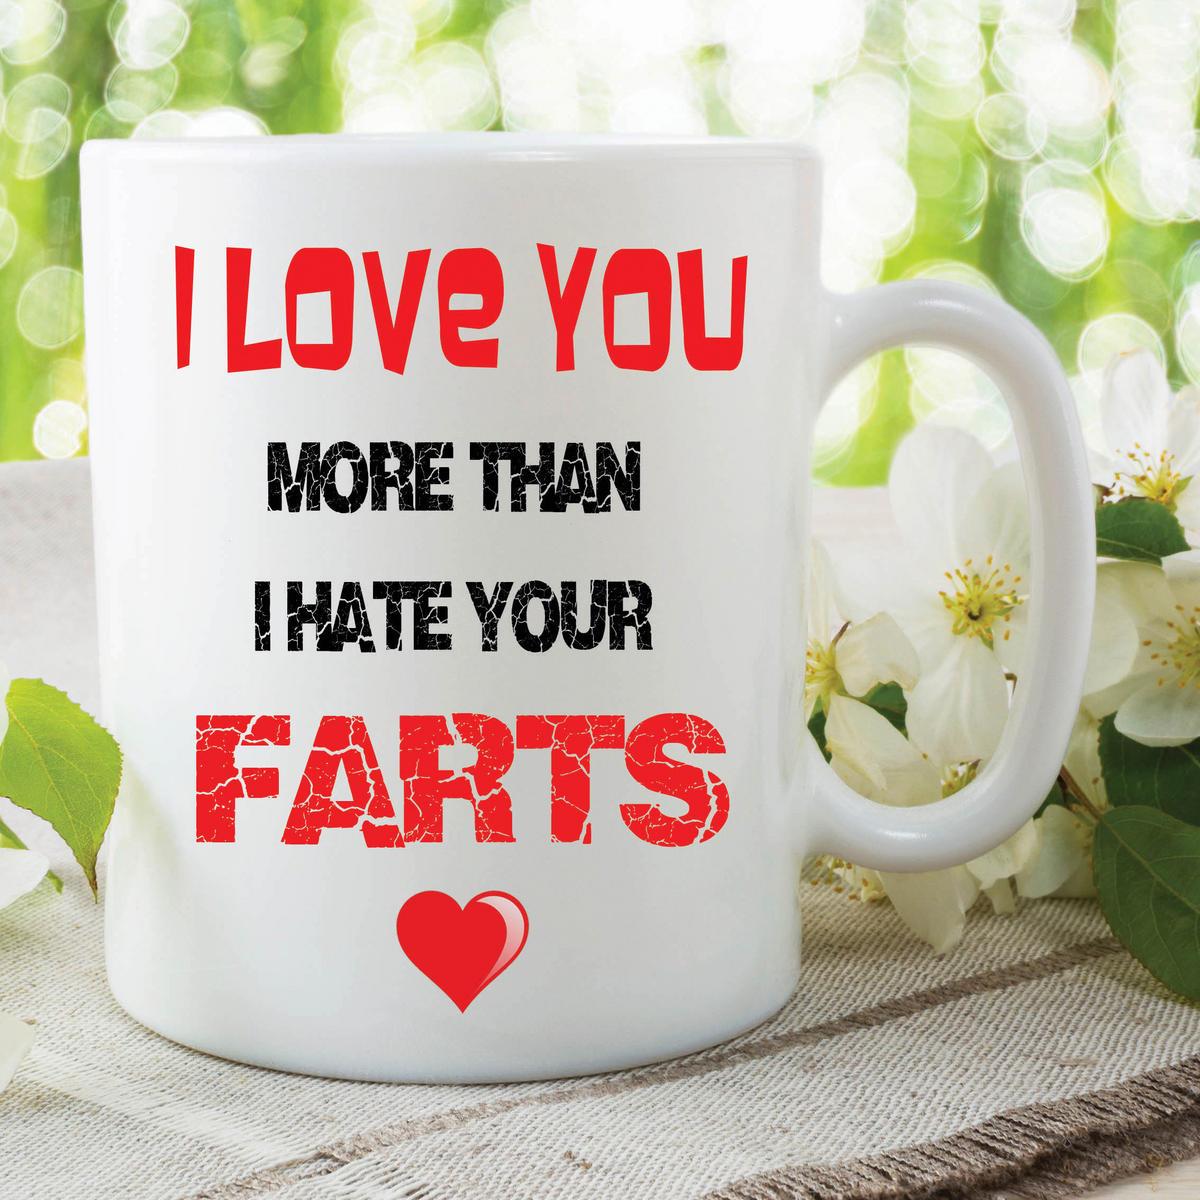 Fart Mug I Love You More Than I Hate Your Farts Funny Novelty Gift Cup WSDMUG593